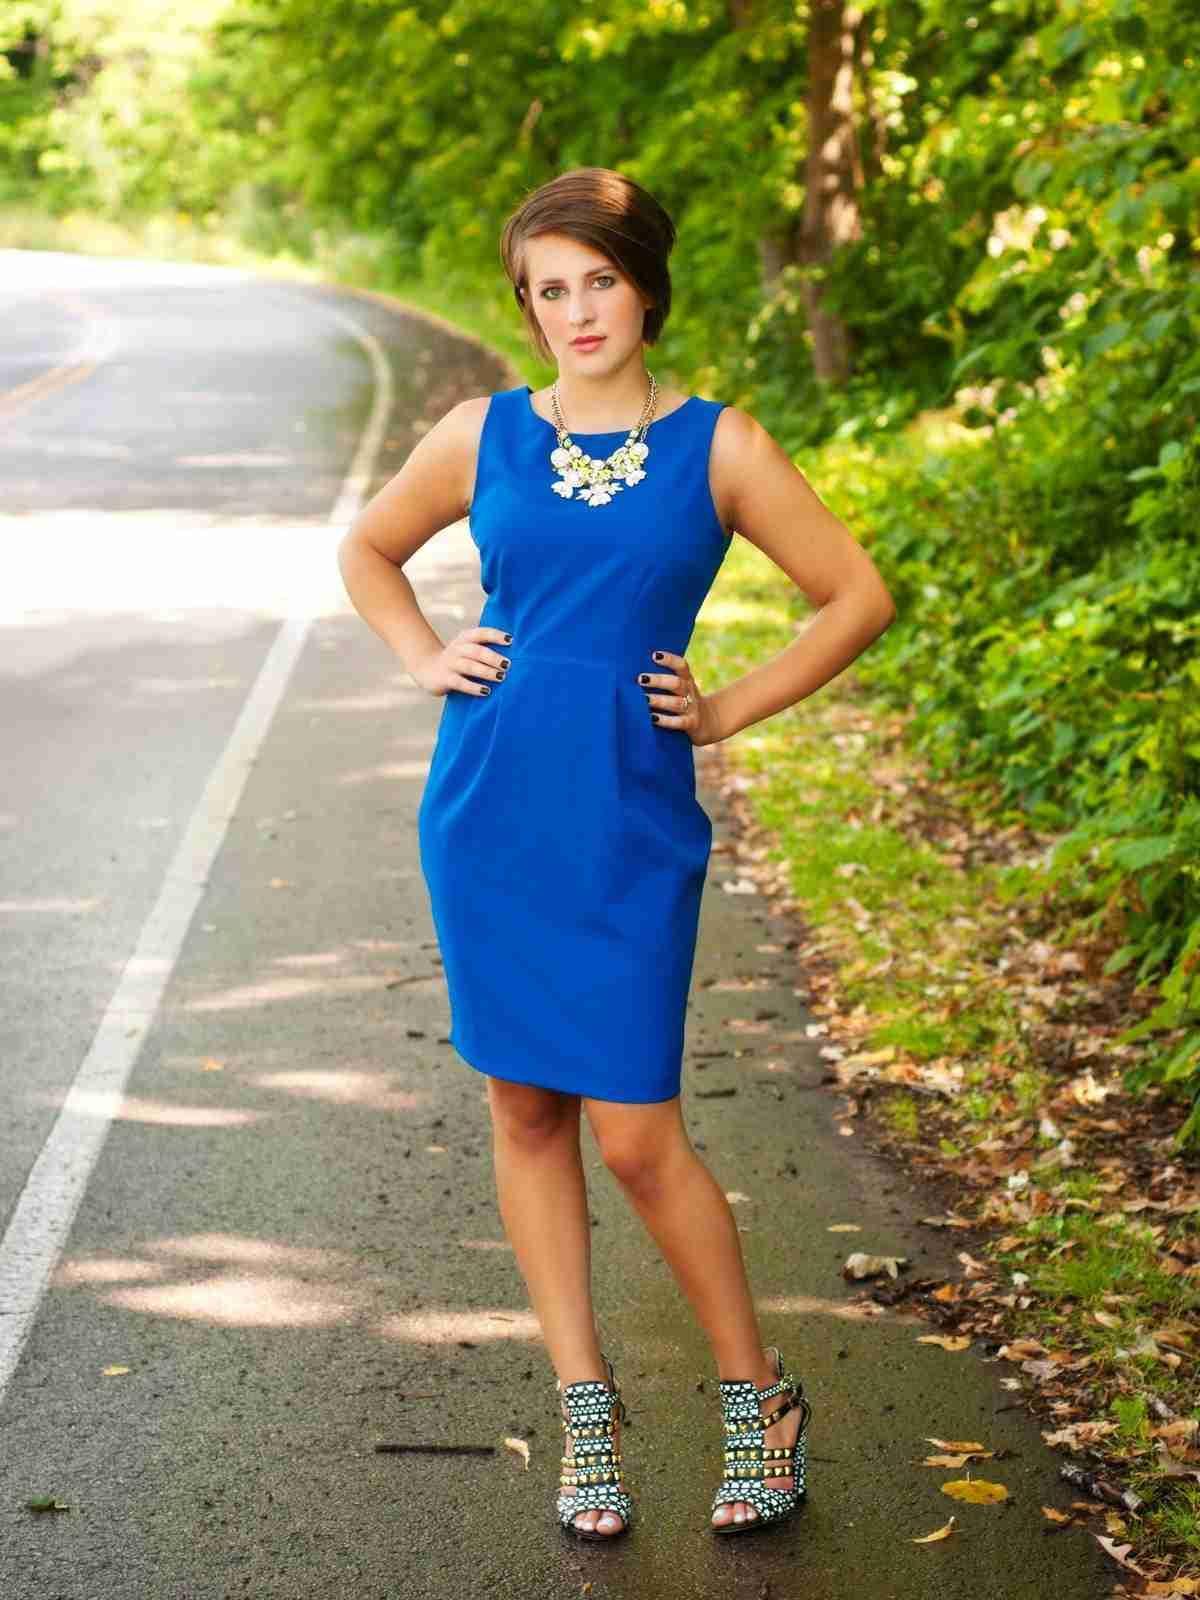 Que zapatos combinar con un vestido azul claro